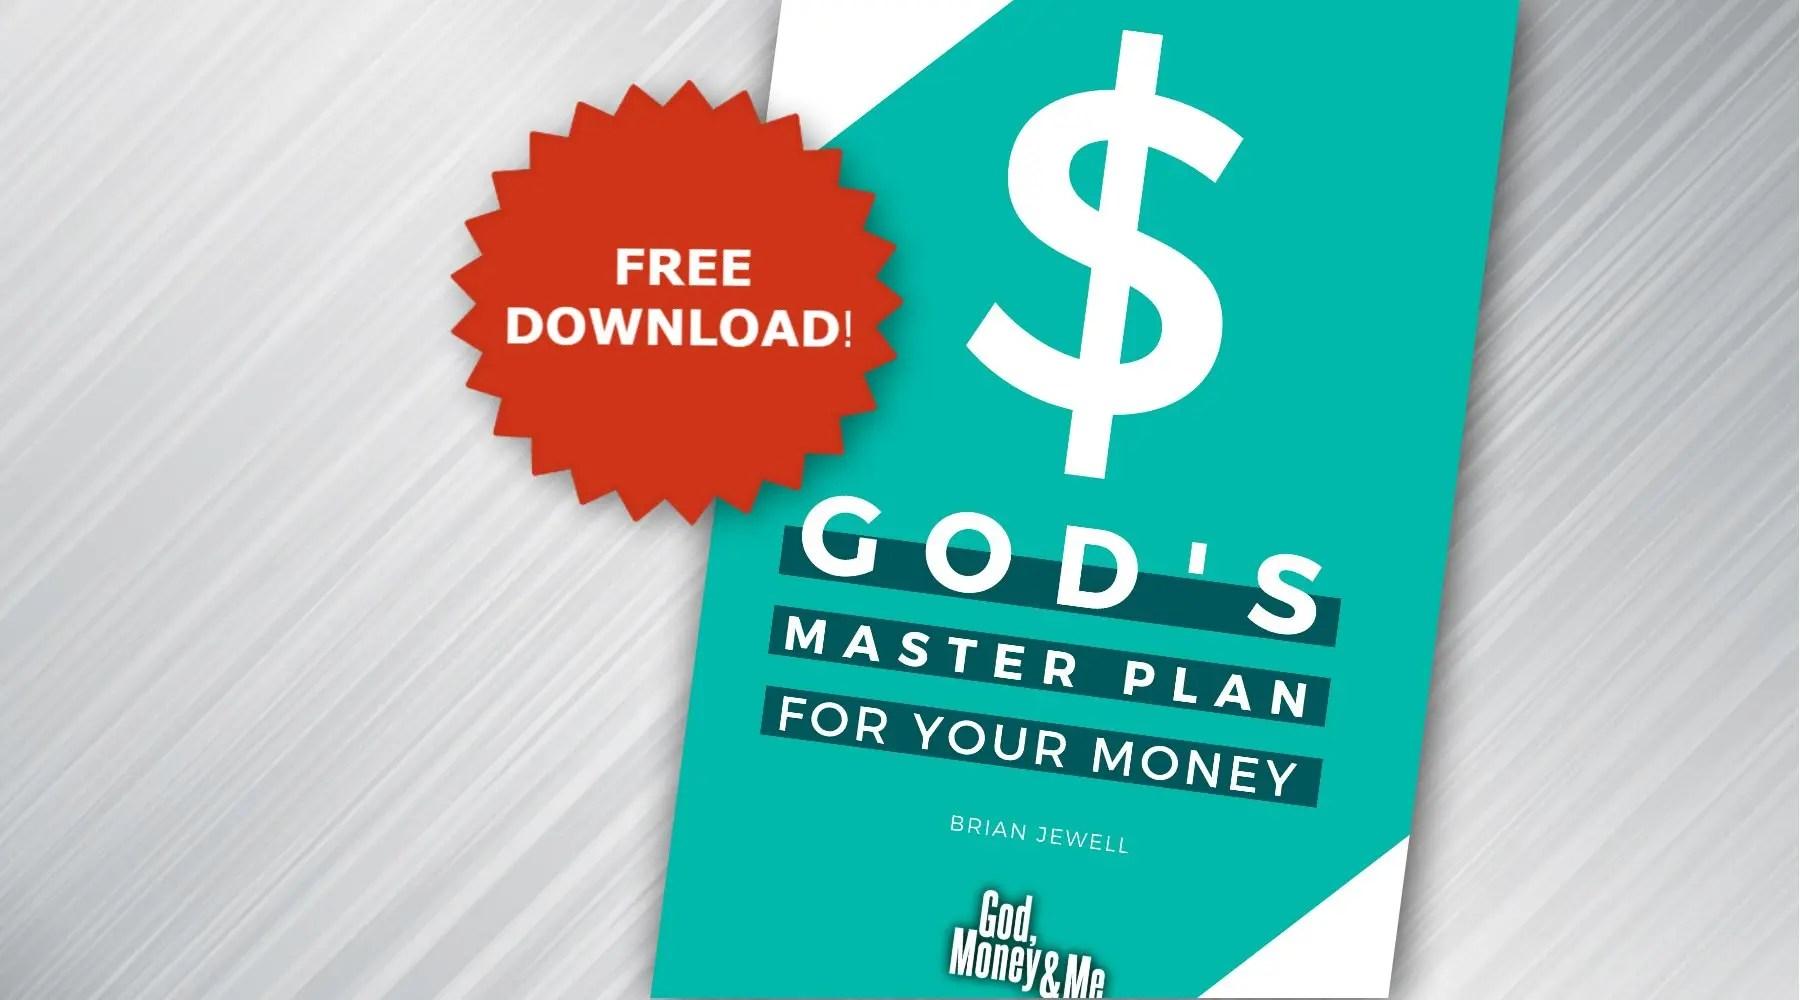 God's Master Plan